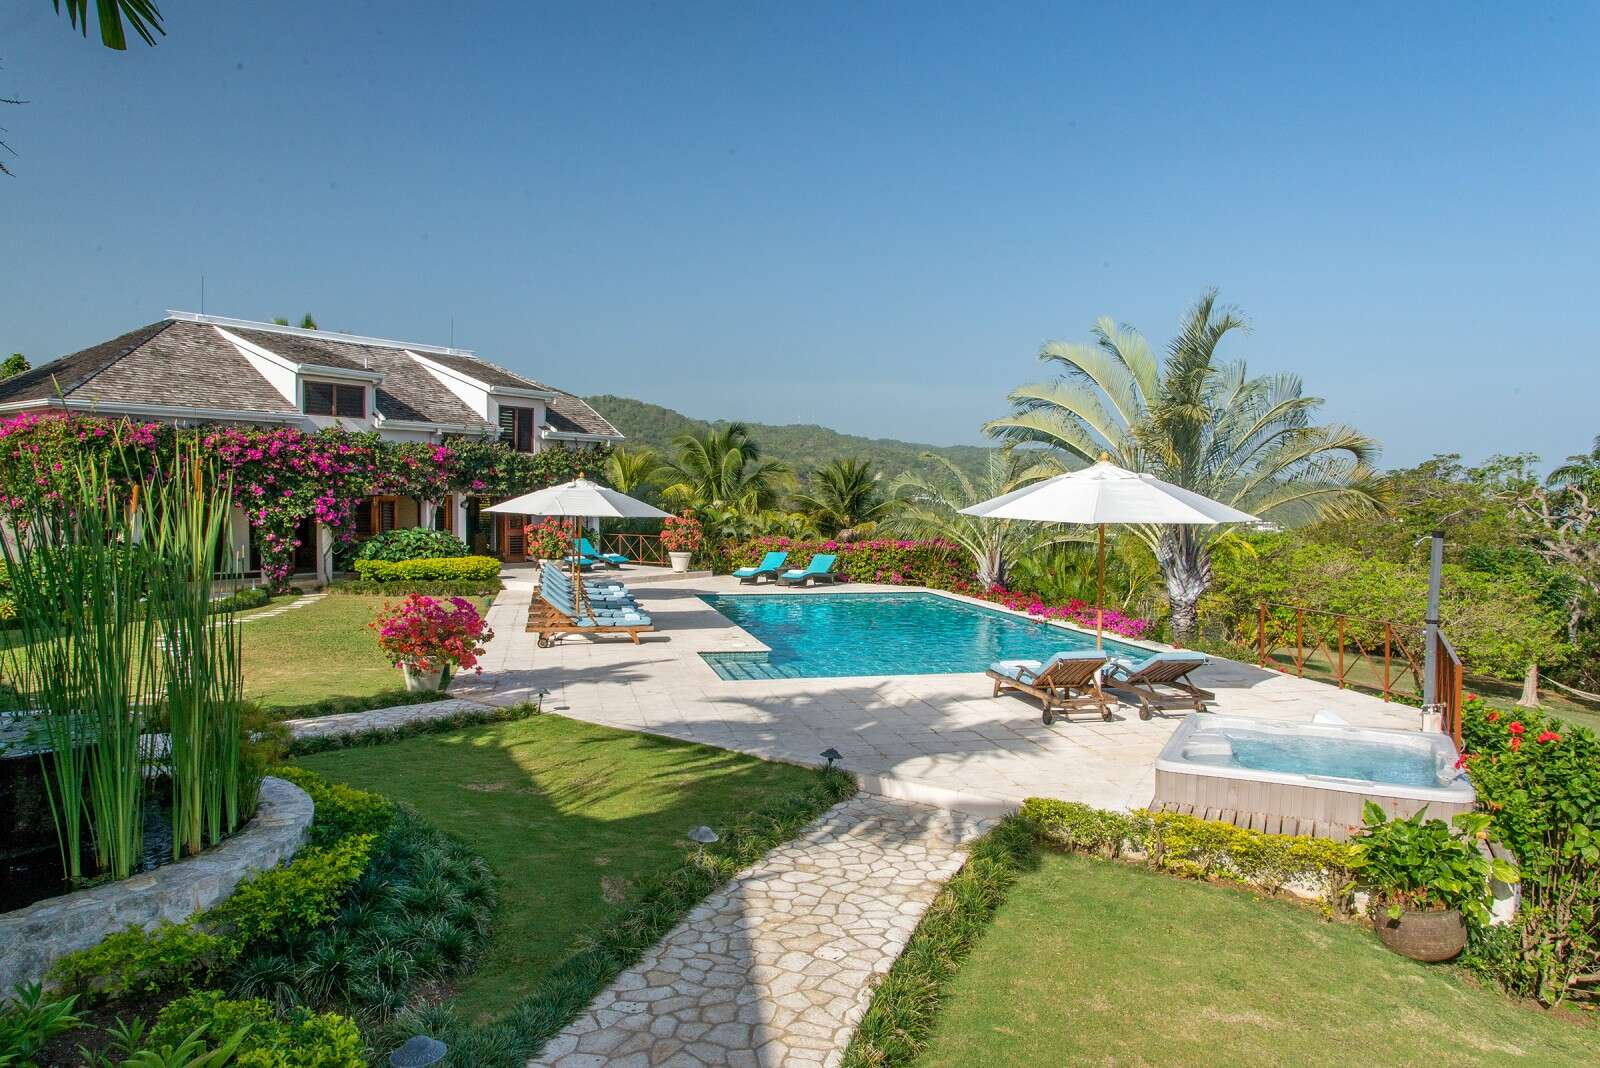 Luxury villa rentals caribbean - Jamaica - Try all club - Sugar Hill - Image 1/28